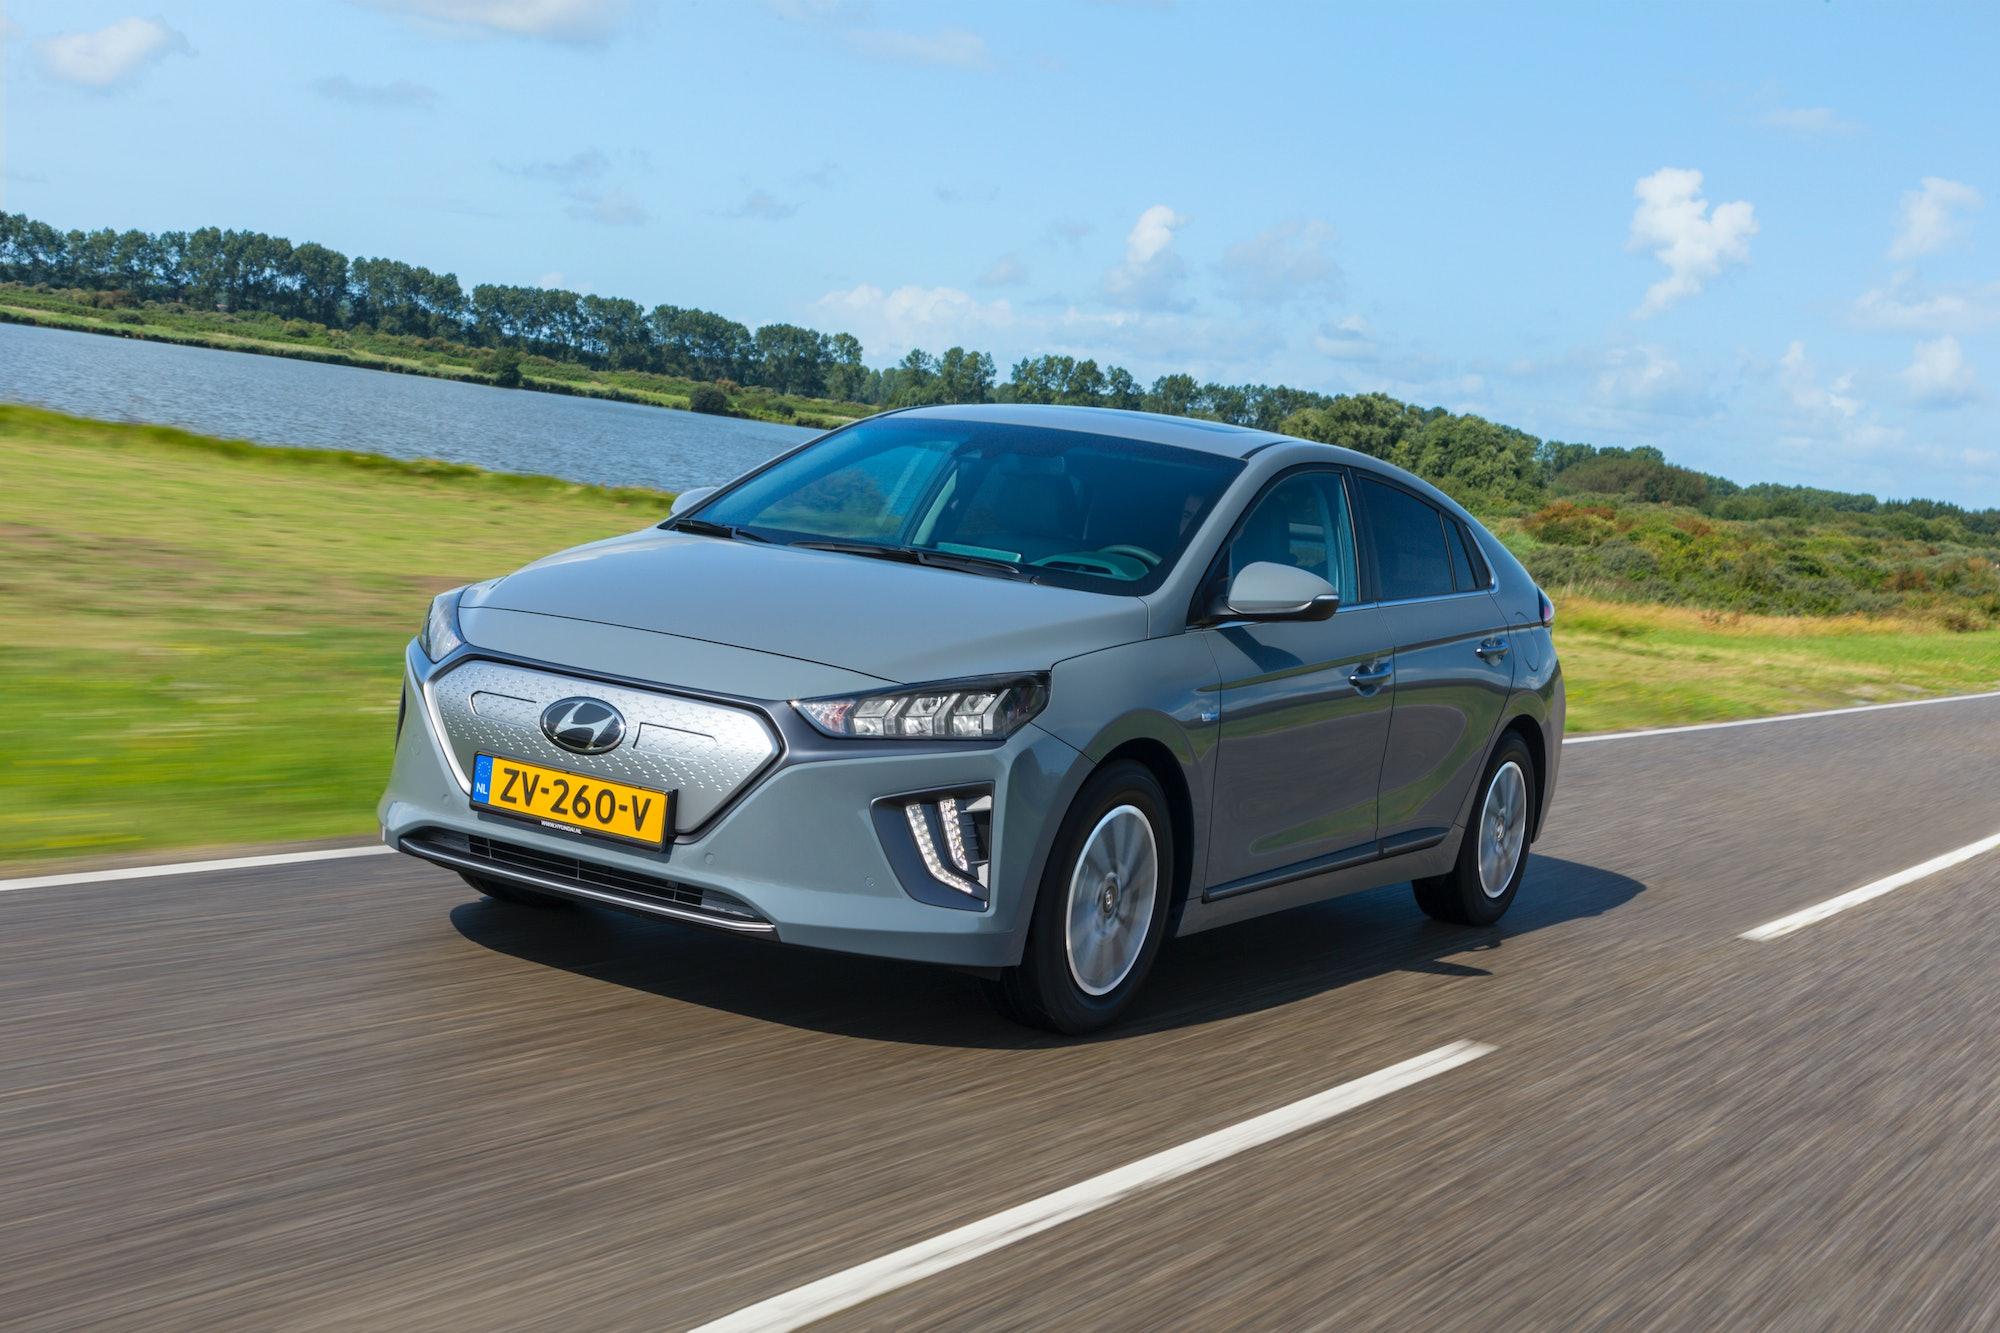 Hyundai Ioniq Electric in motion.